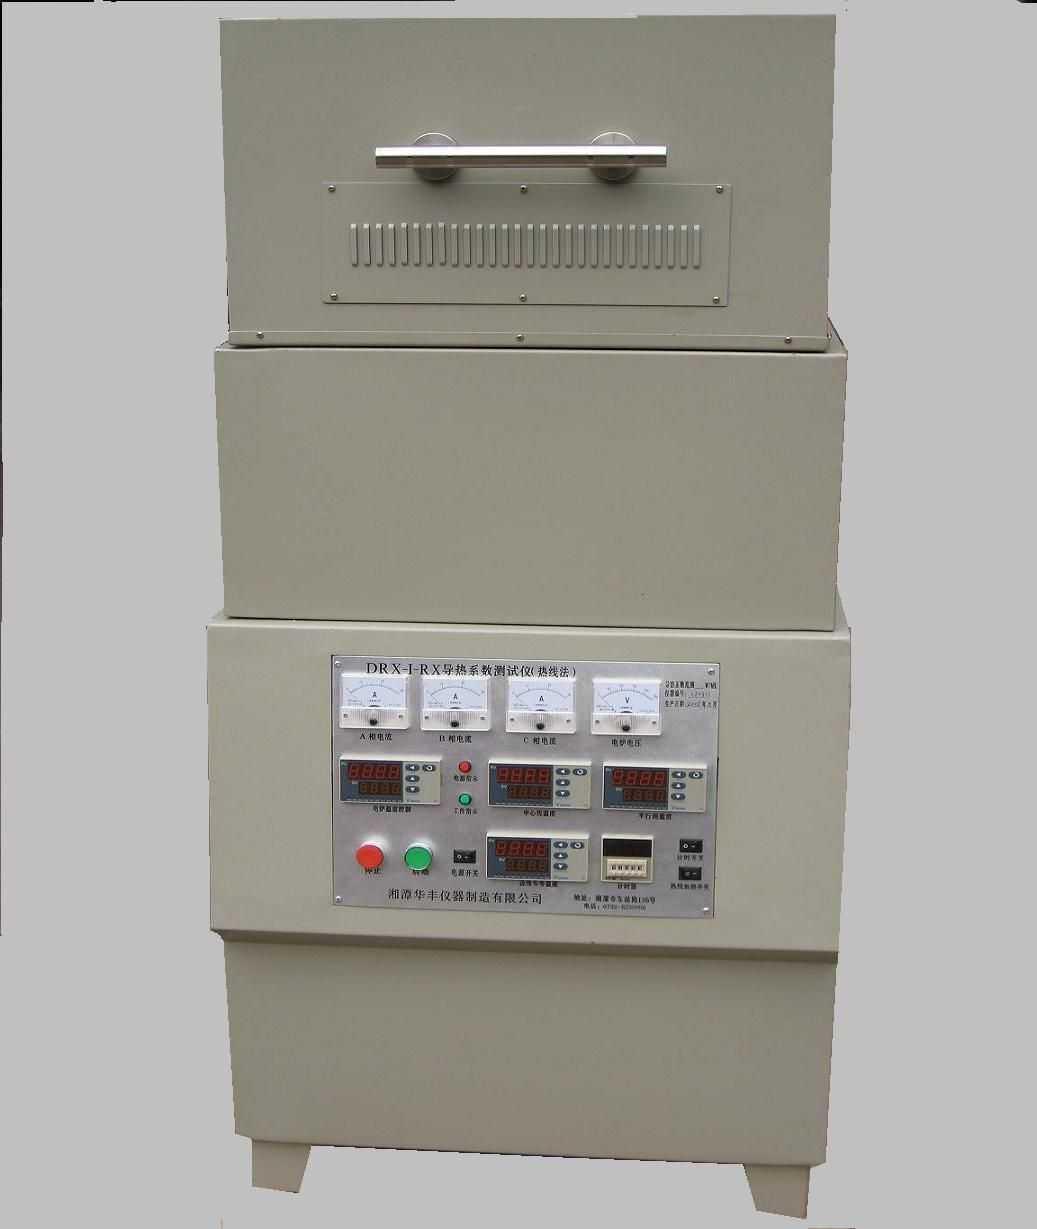 DRX-I-RX热线法导热仪